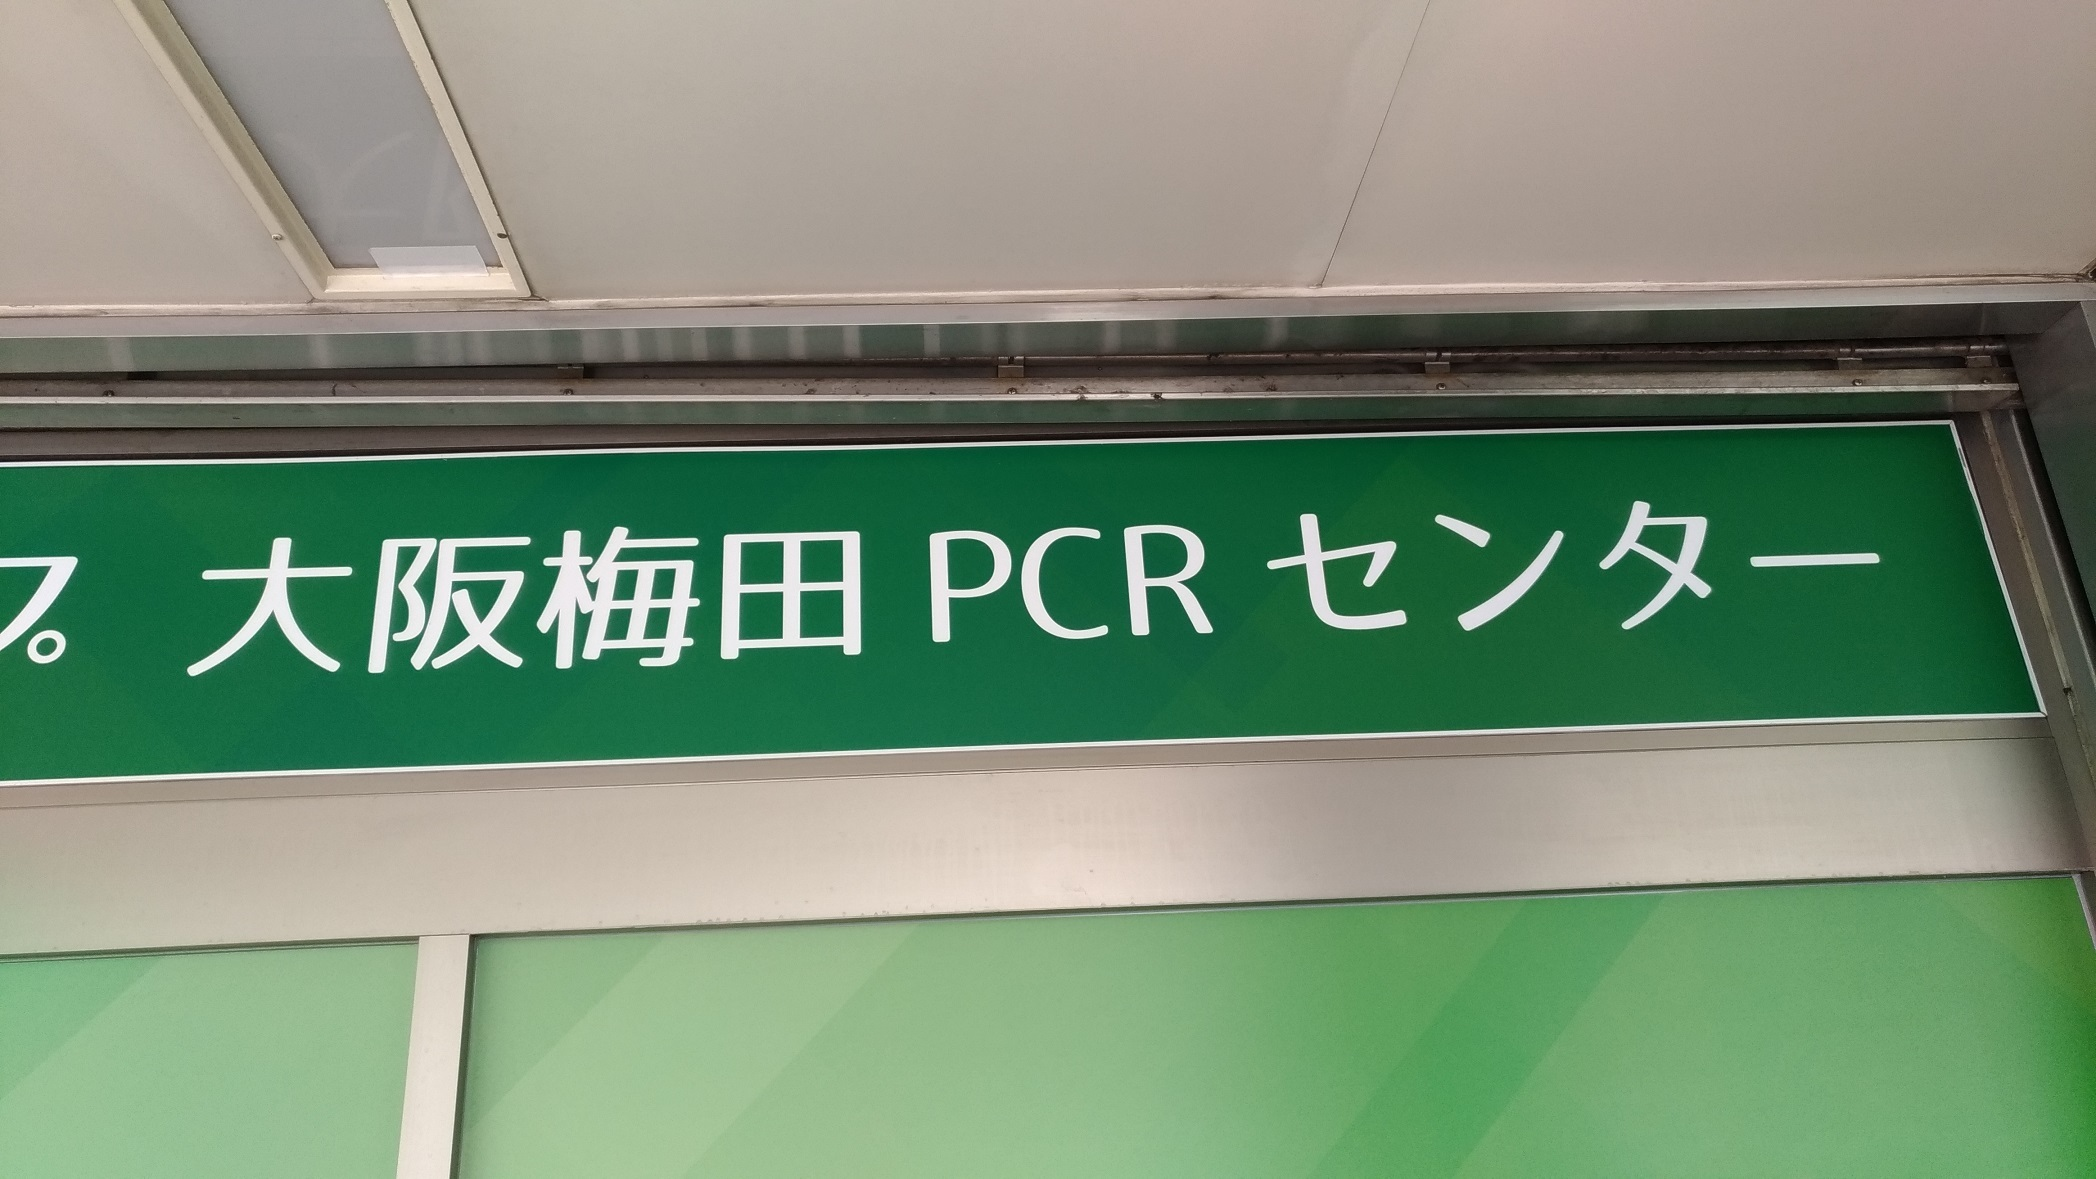 umeda_pcr_2021_04.jpg